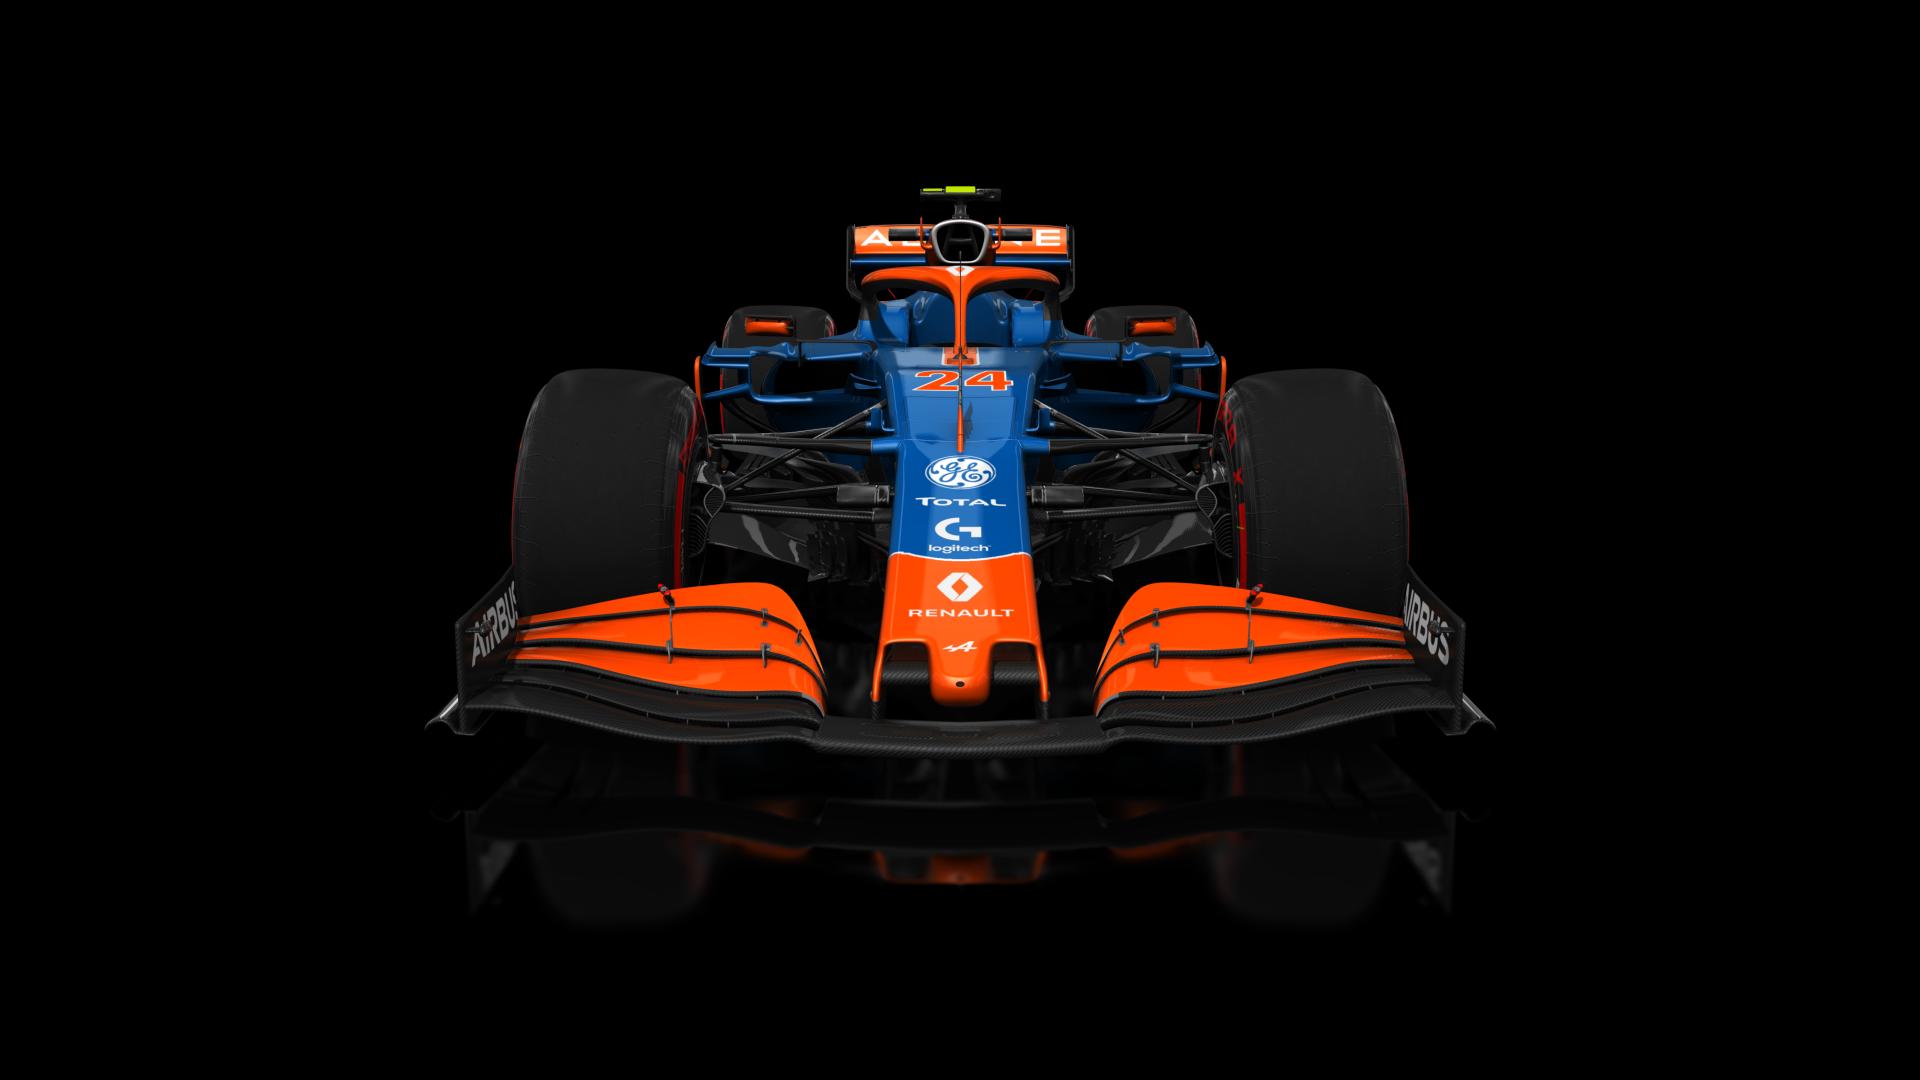 Rss Formula Hybrid 2020 Alpine A500 Racedepartment